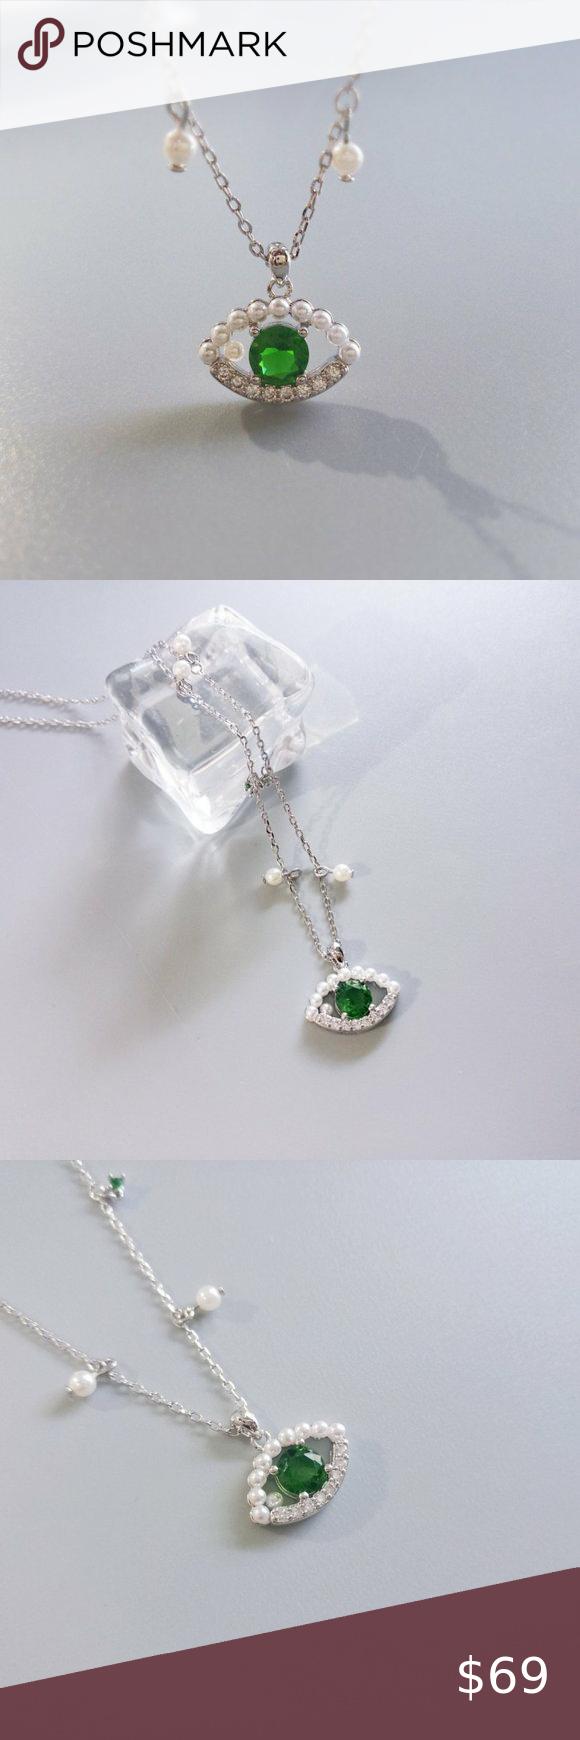 19+ Where can i buy swarovski jewelry viral